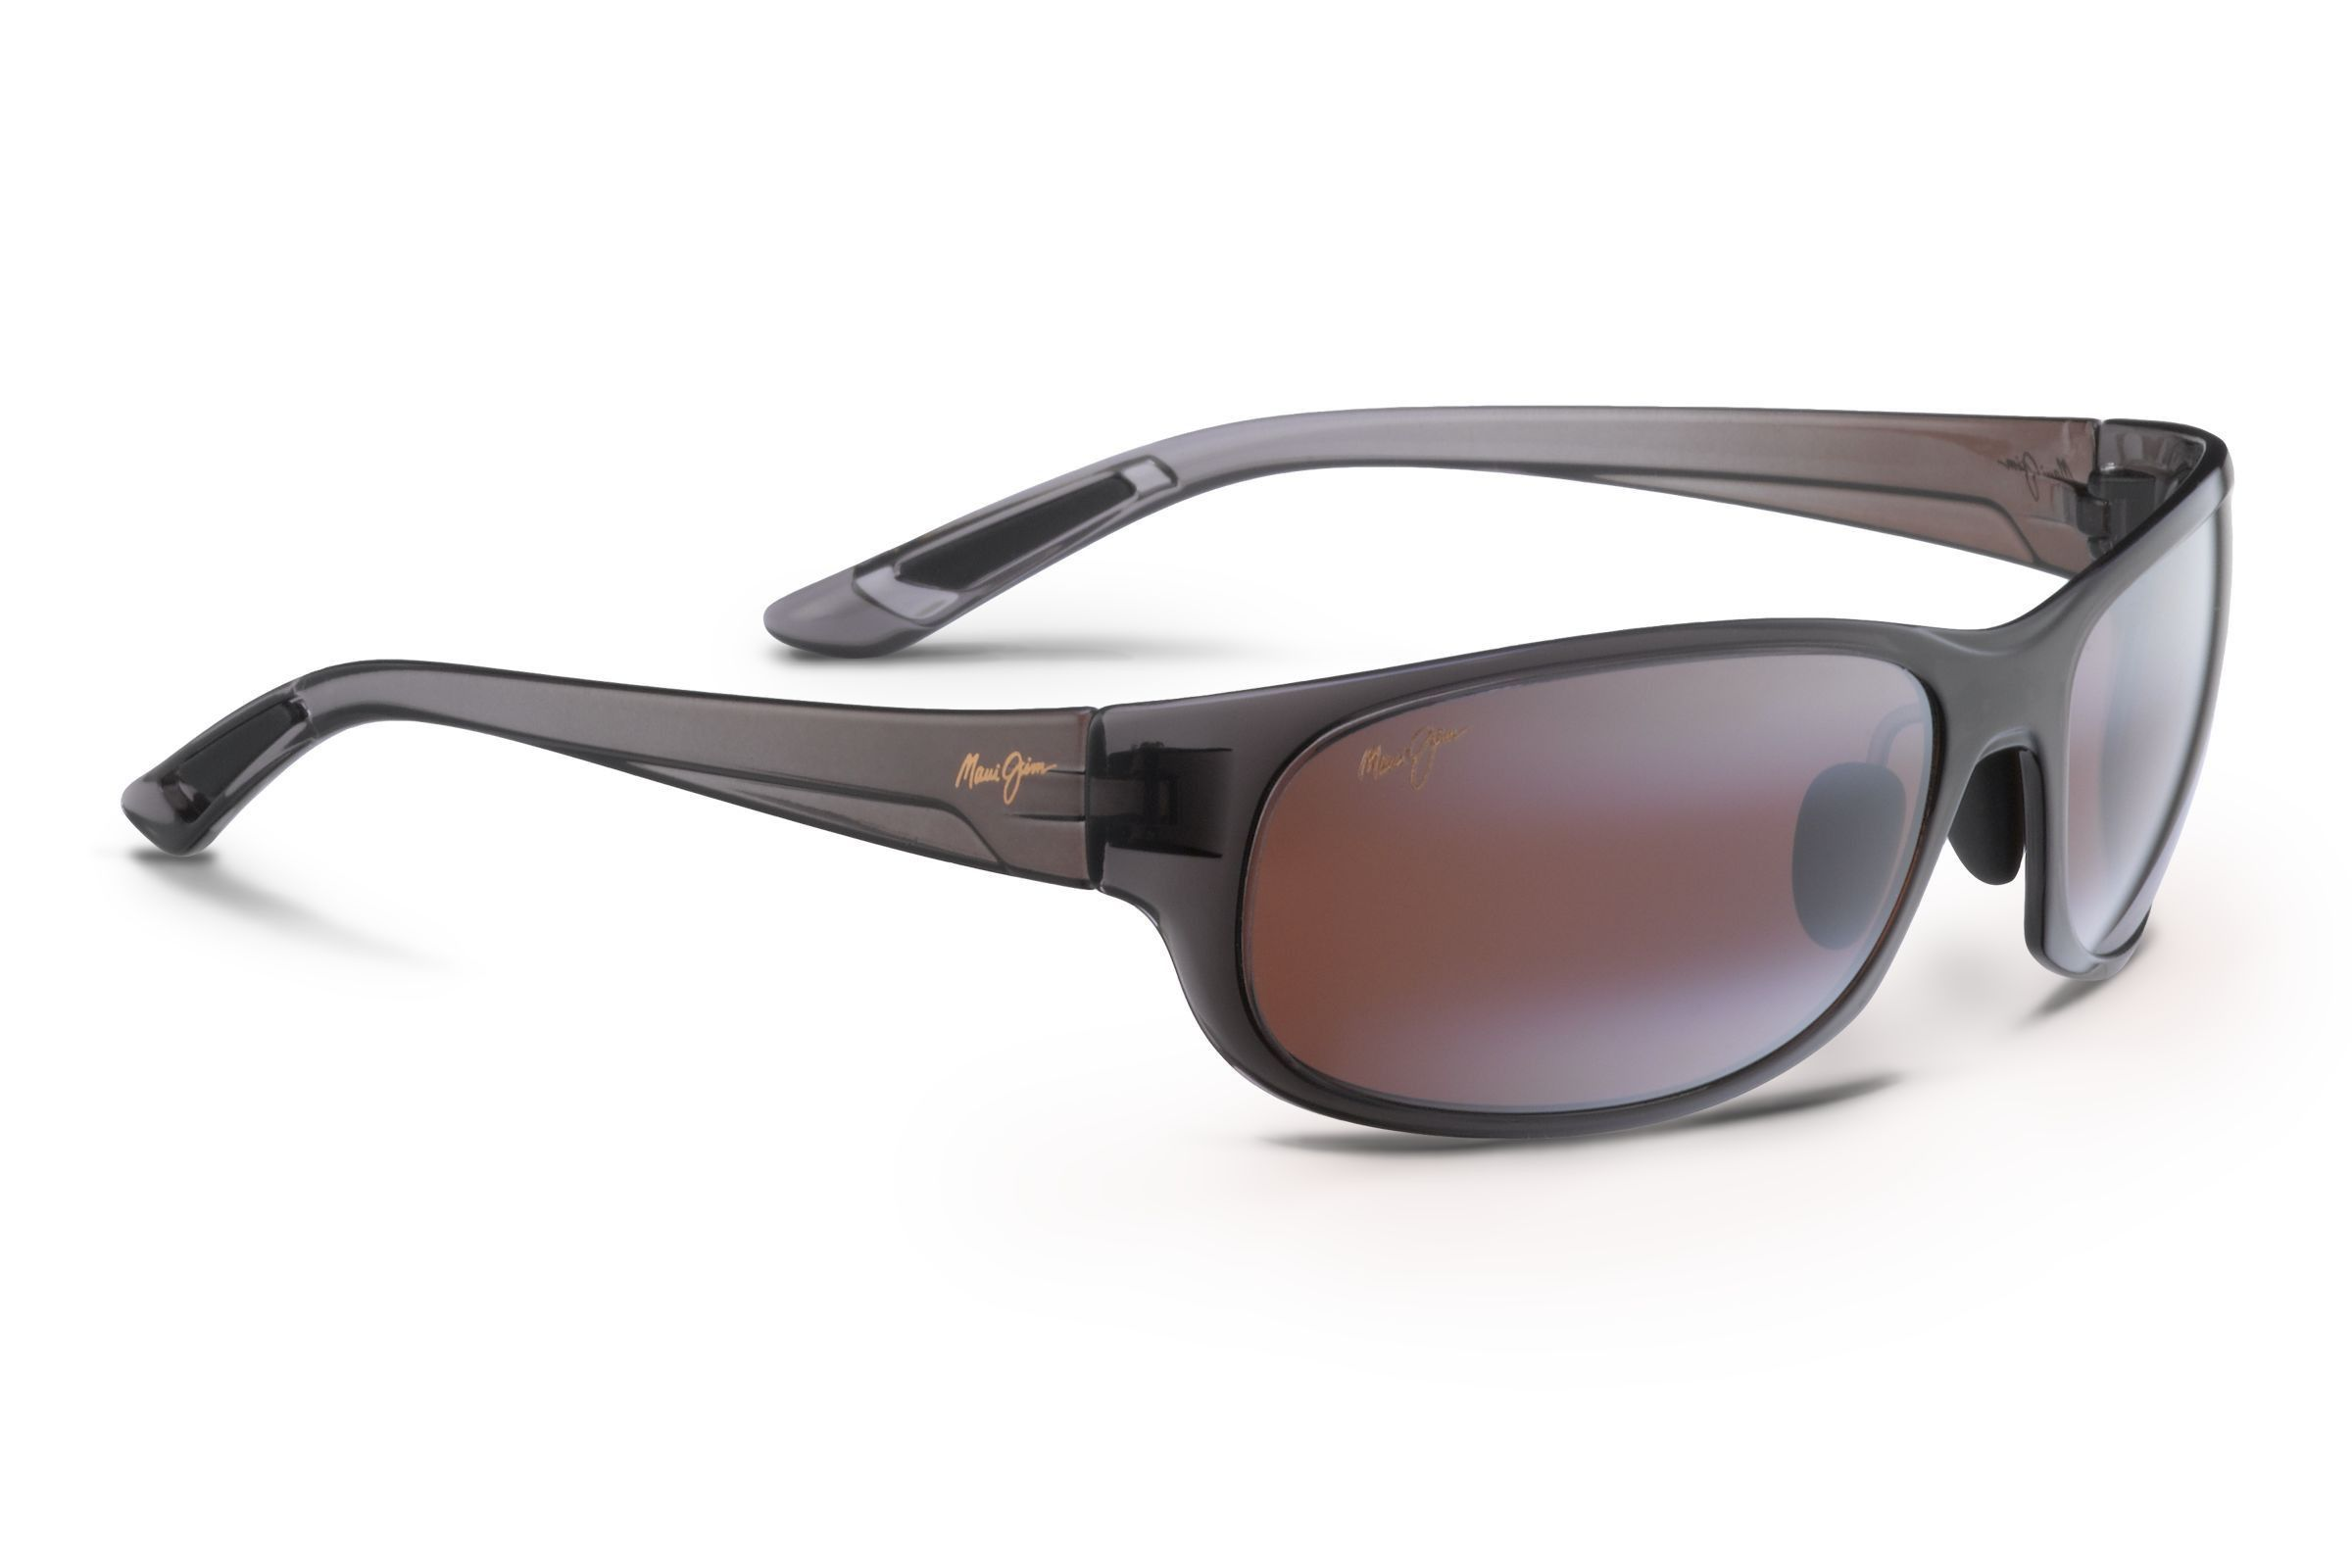 bcf10a171bc5 Maui Jim Twin Falls Sunglasses | Products | Maui jim, Maui jim ...